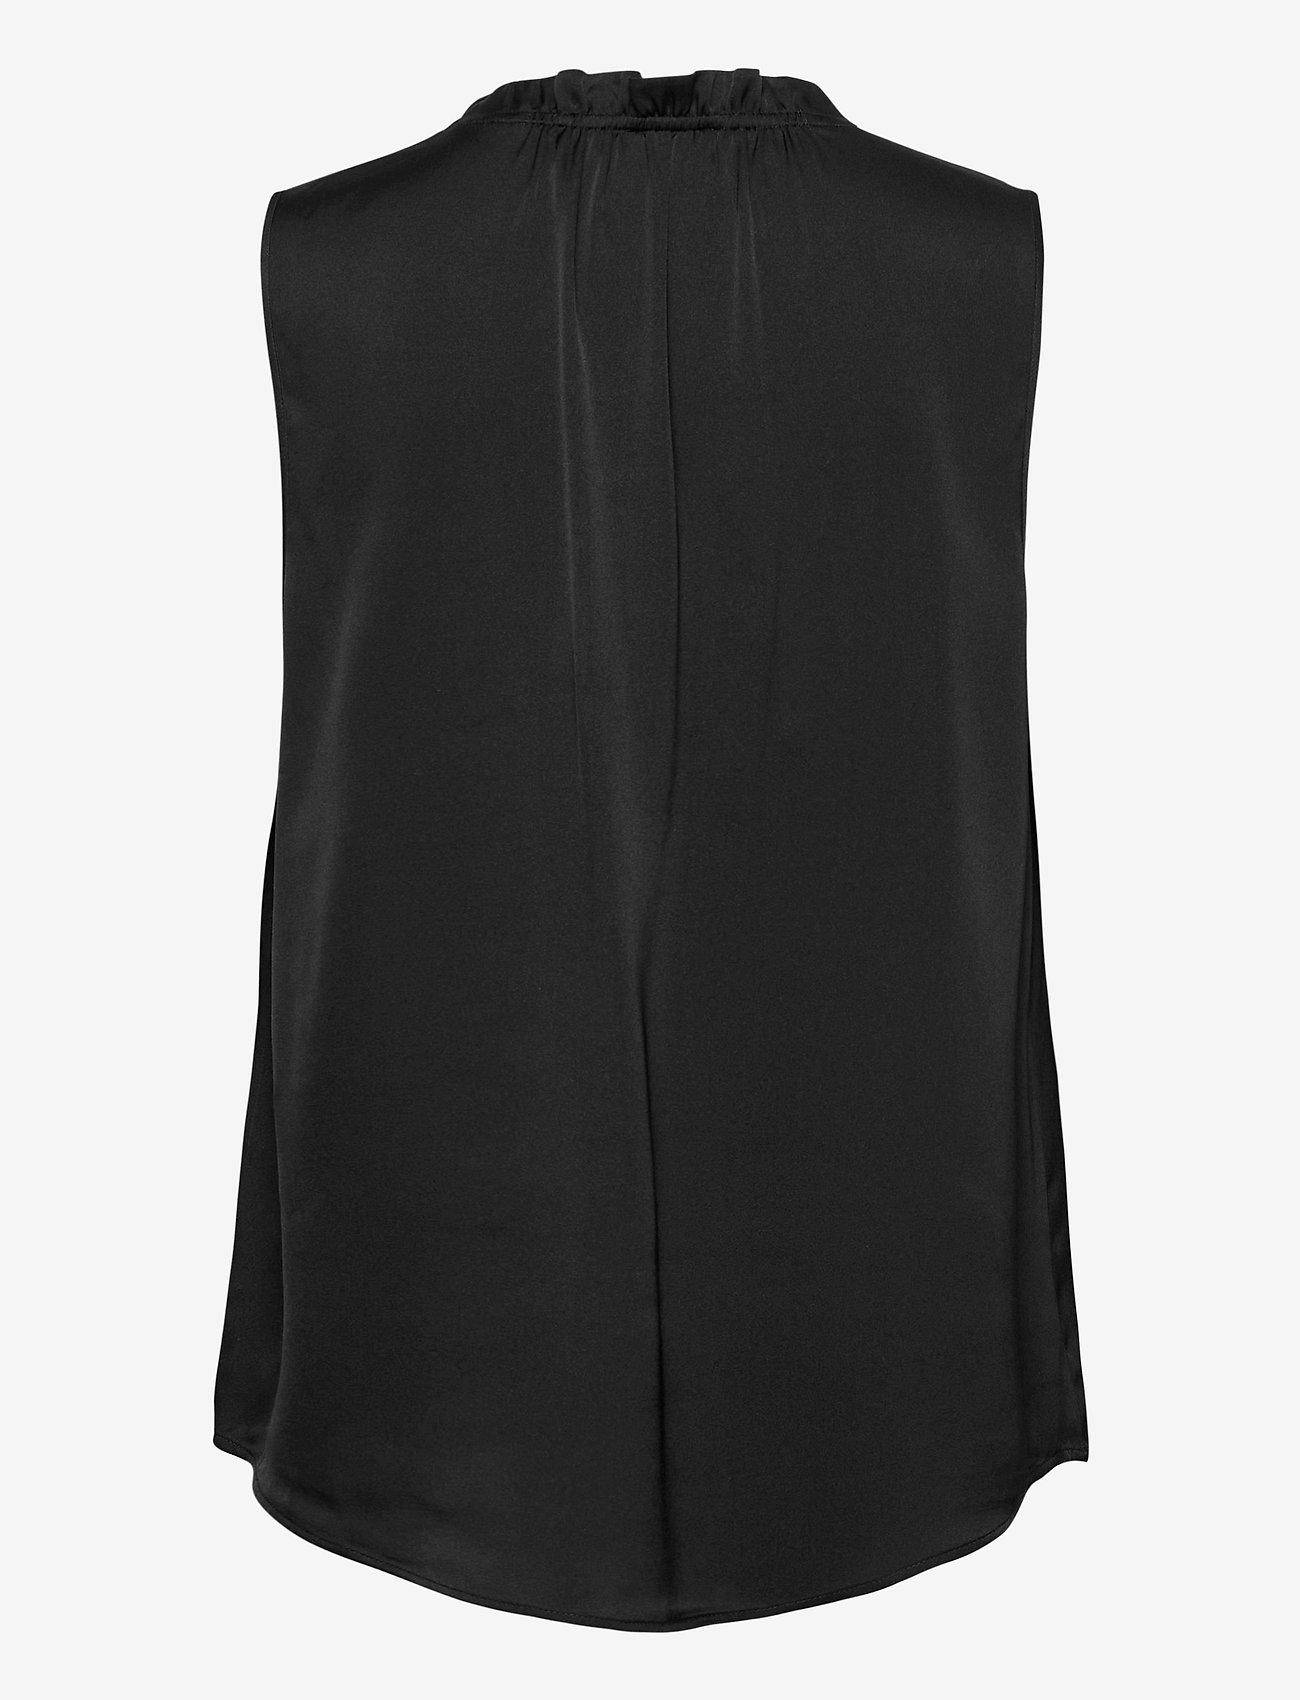 SAND - Satin Stretch - Raya F - blouses sans manches - black - 1